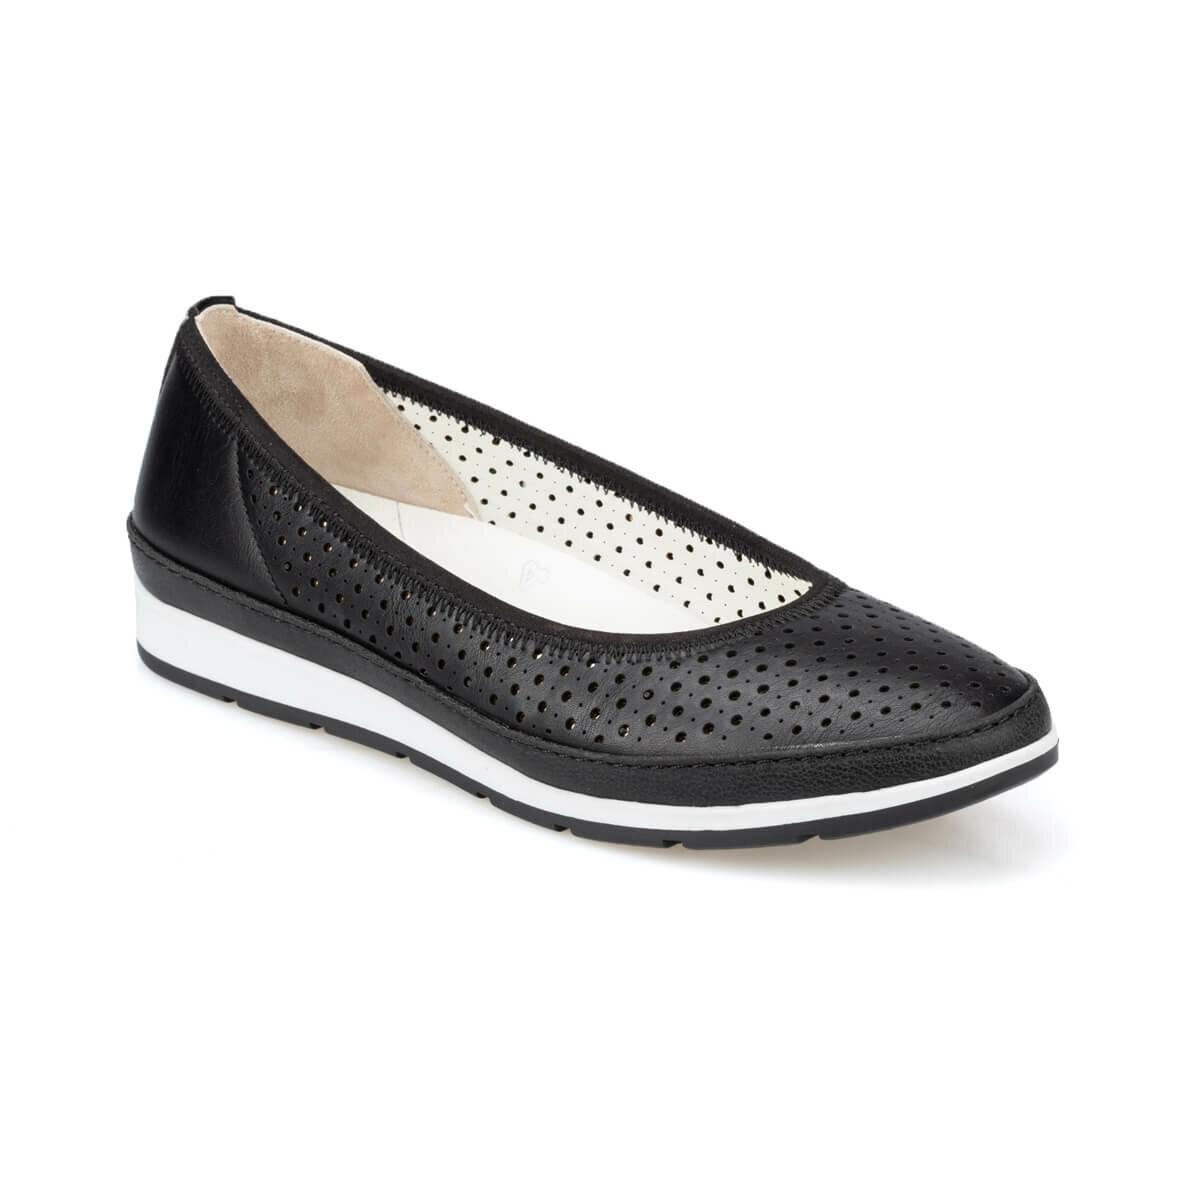 FLO 91.100689.Z Black Women Shoes Polaris 5 Point